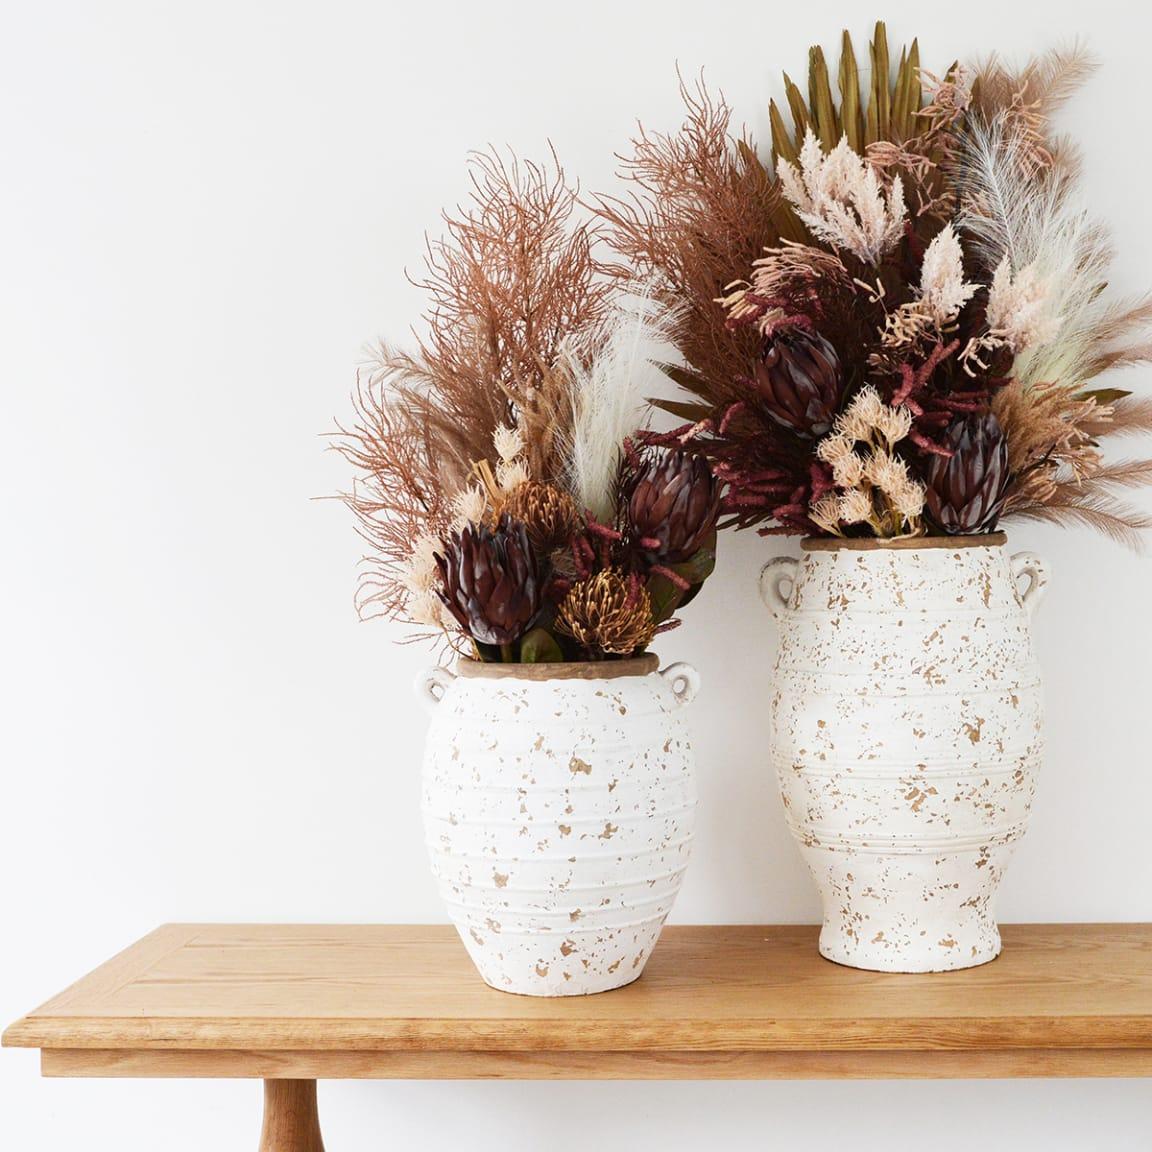 Habitania: Bouquets made to last